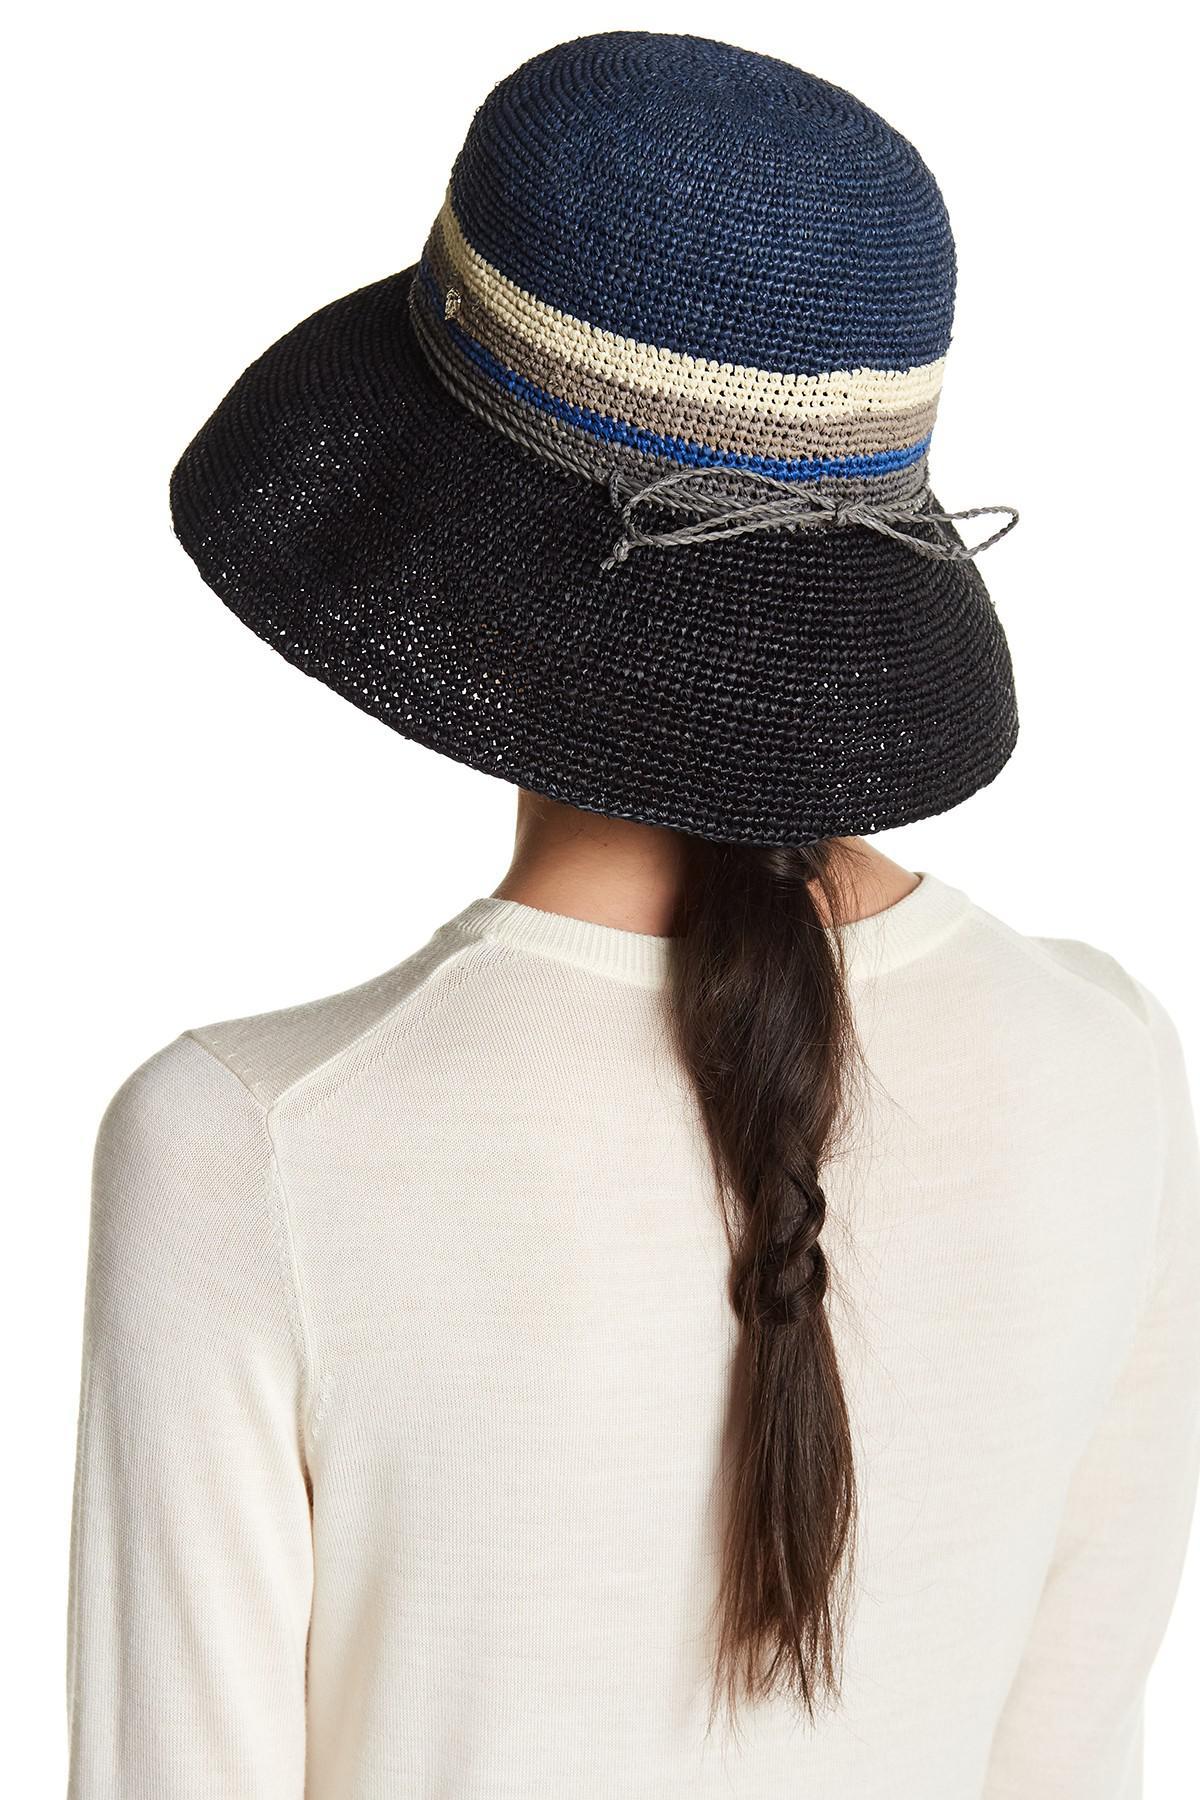 202e8be5f57c4 Helen Kaminski Provence Colorblock Woven Floppy Hat - Lyst